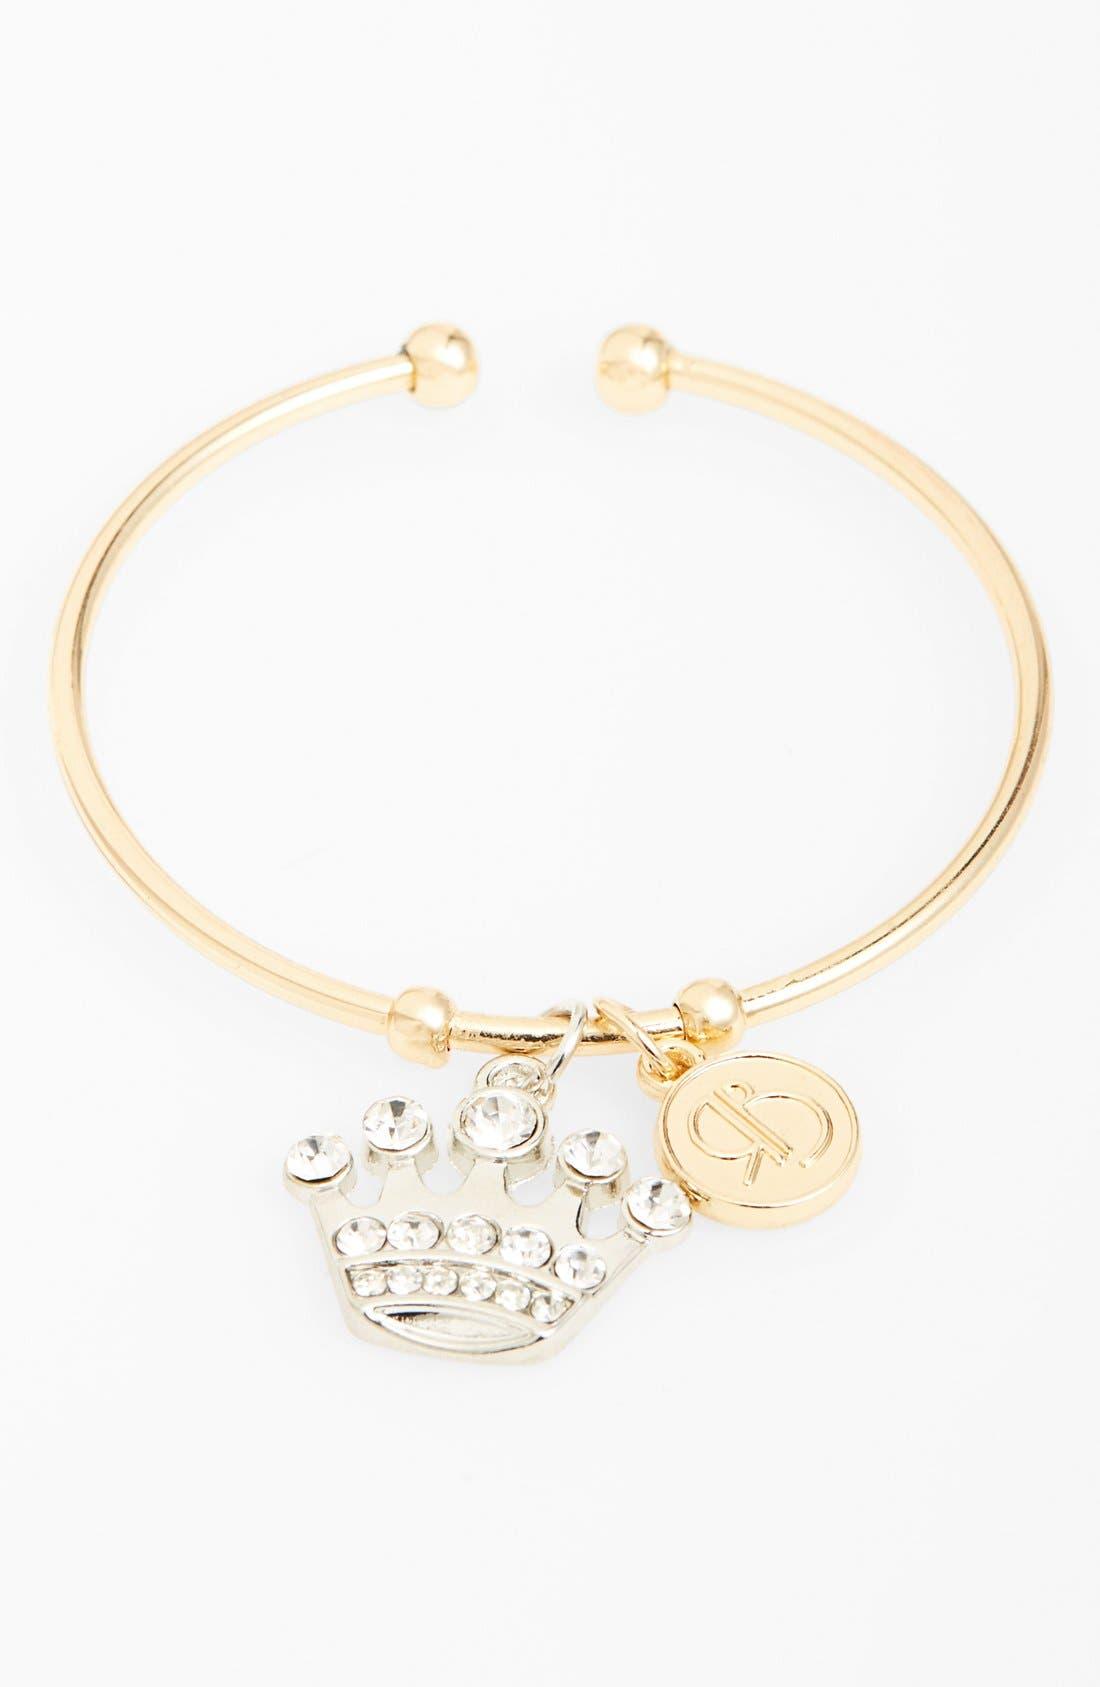 Main Image - Rolf Bleu 'Madison - Crown' Bracelet